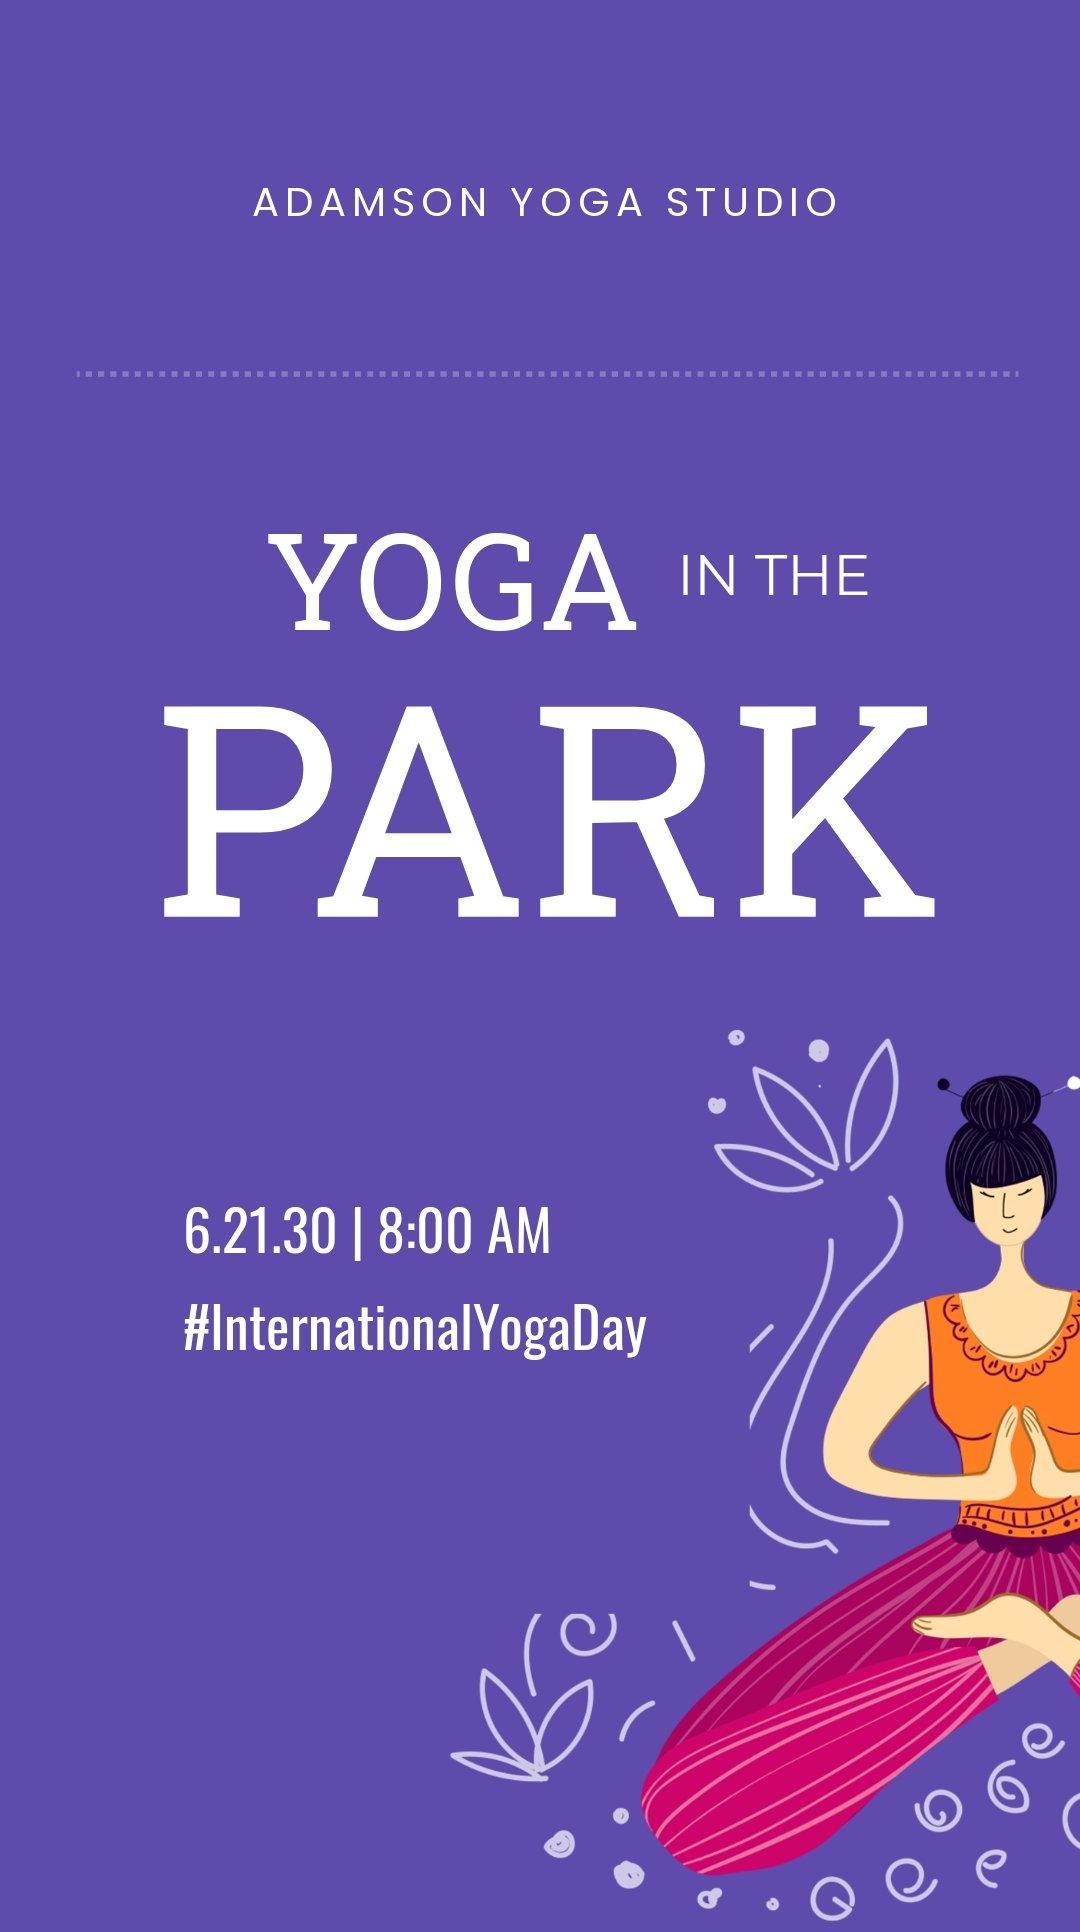 Free International Yoga Day Instagram Story Template